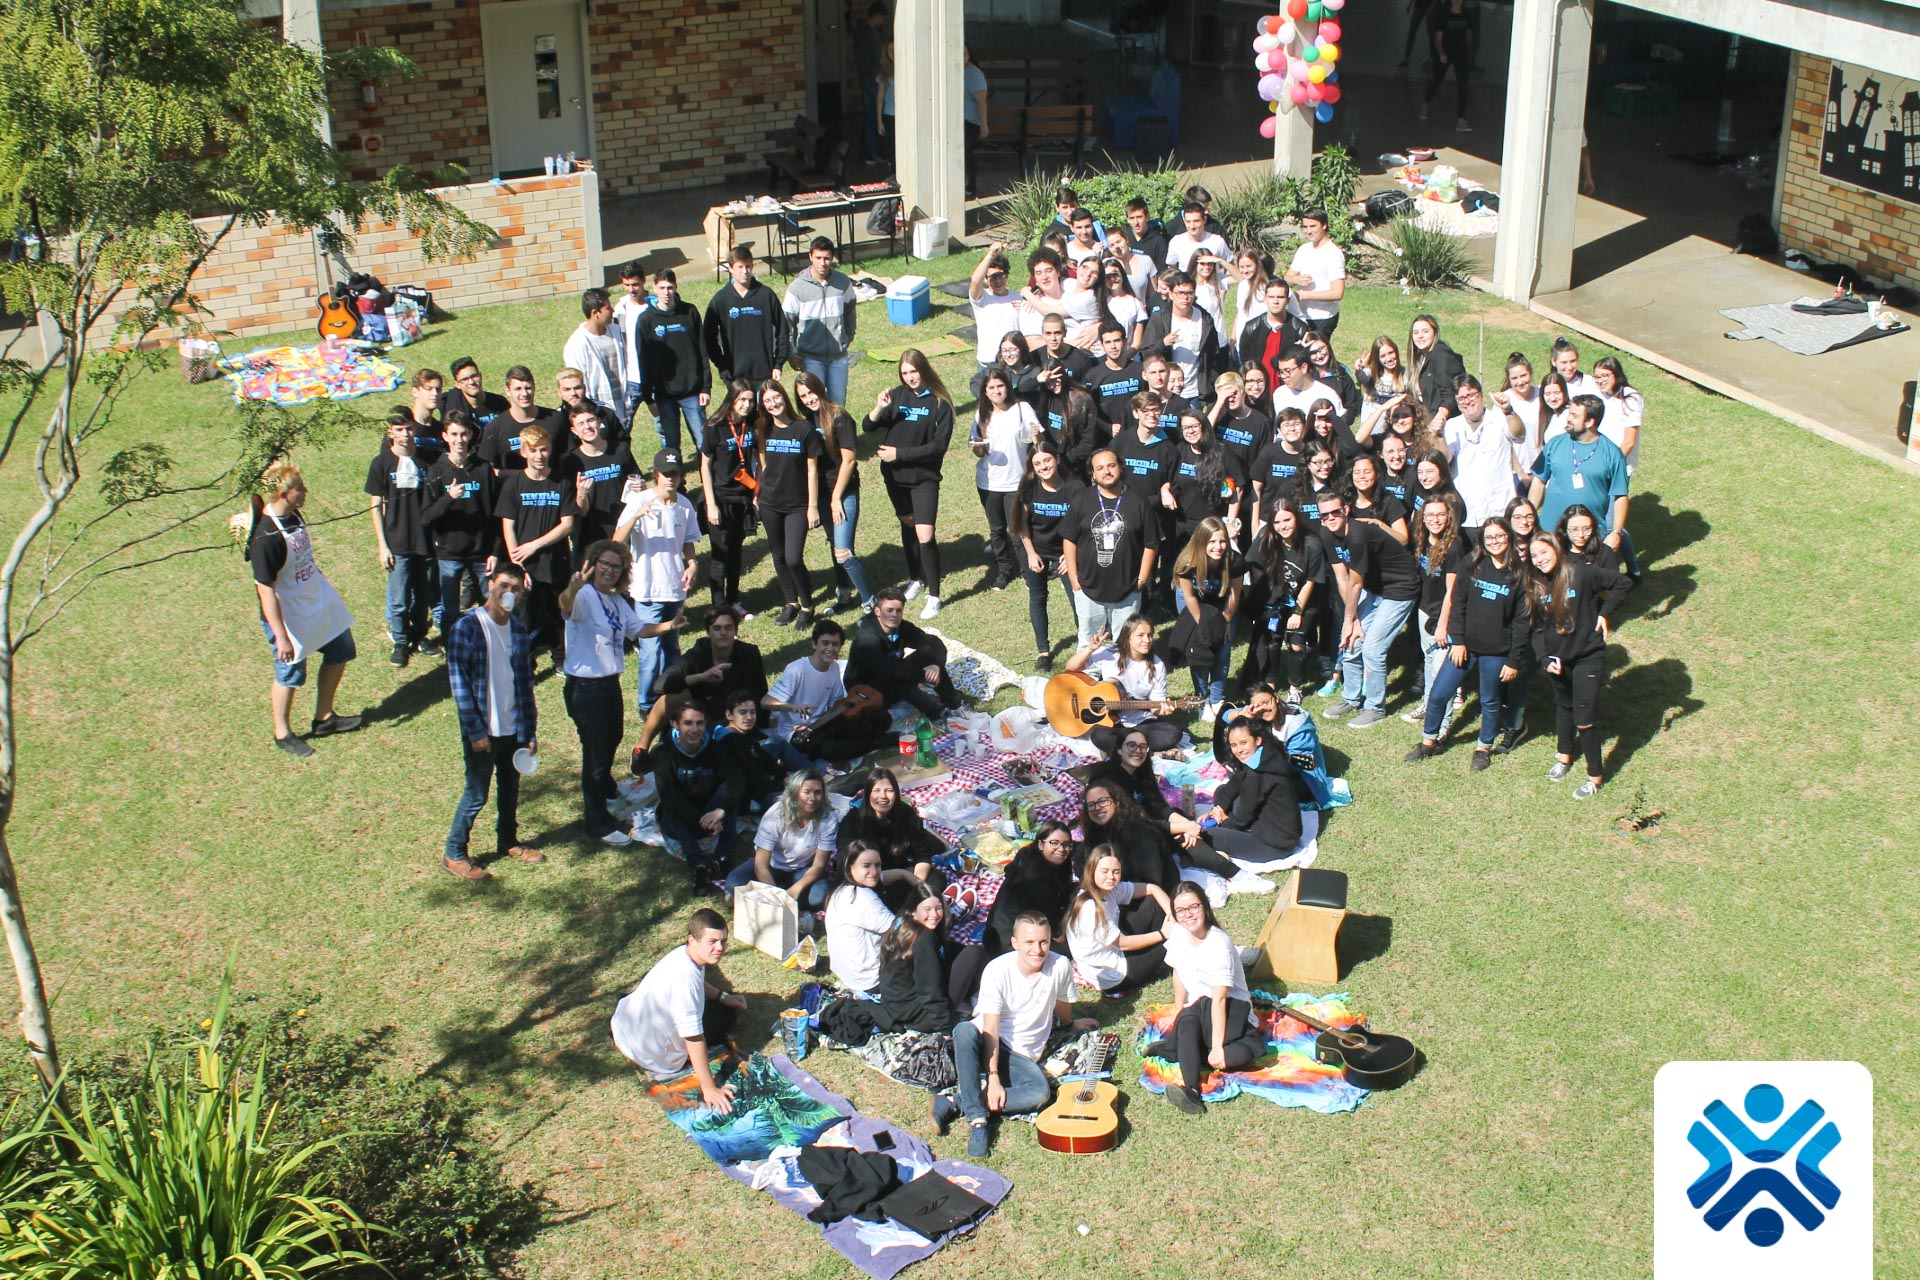 Piquenique Musical Colégio Universitário – 12/08/2019